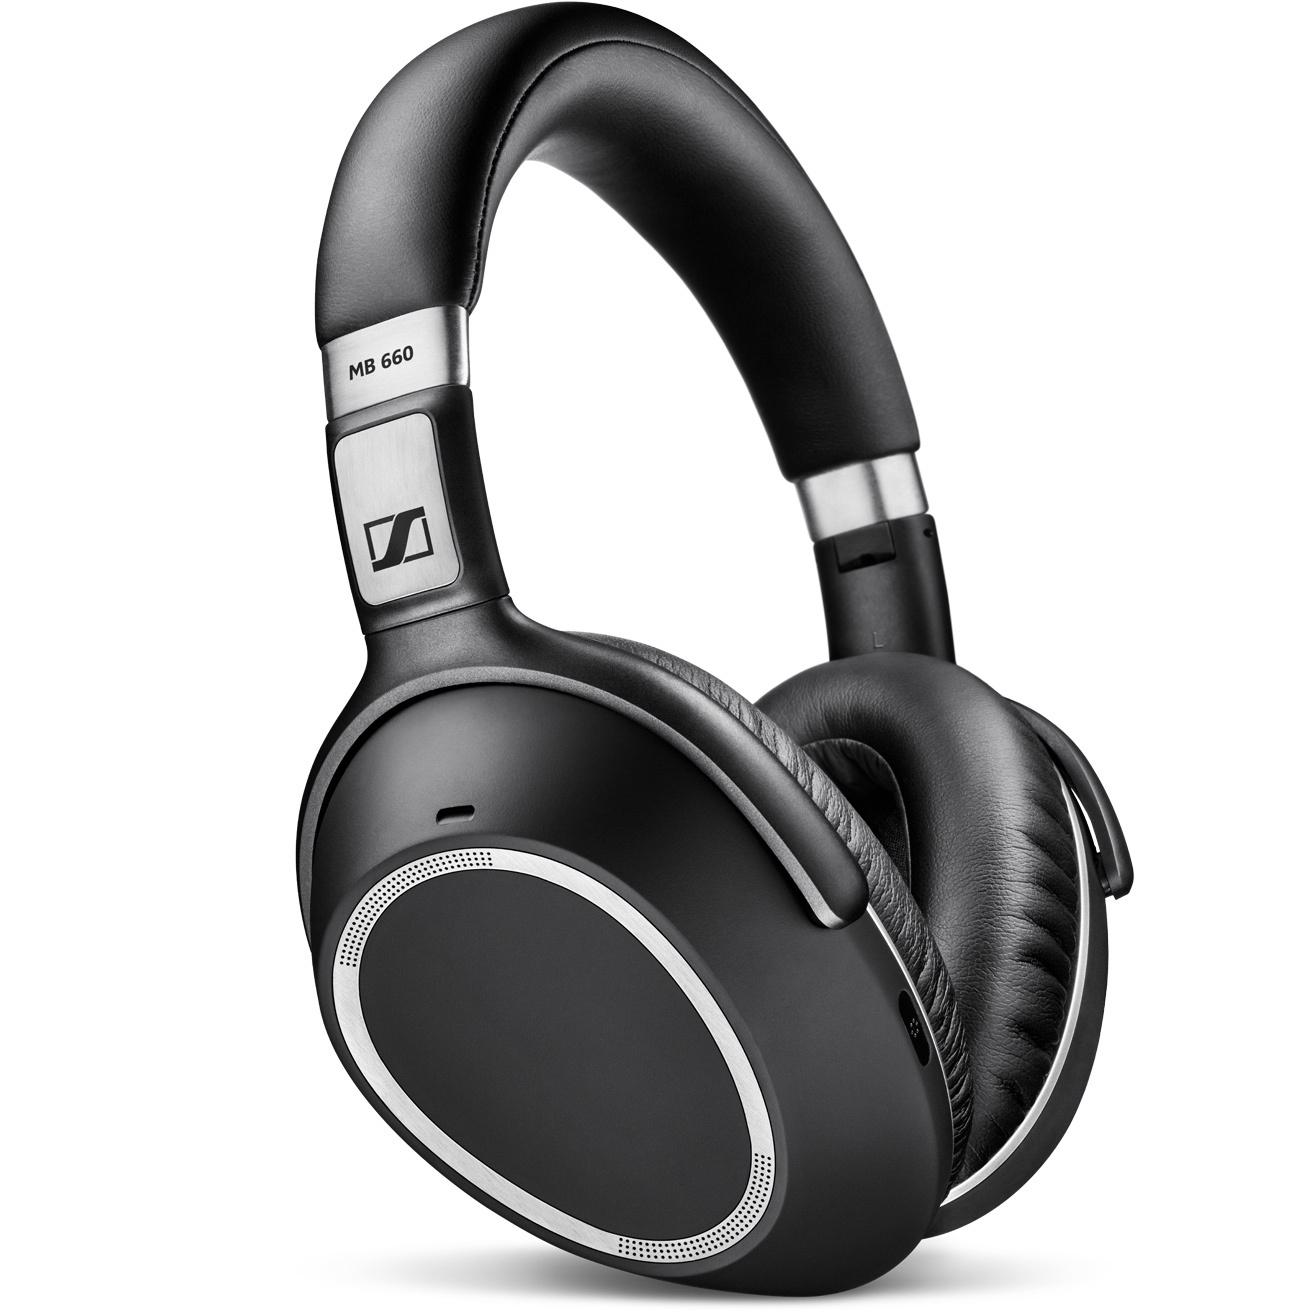 Sennheiser MB 660 UC MS Binaural Head-band Black,Silver headset